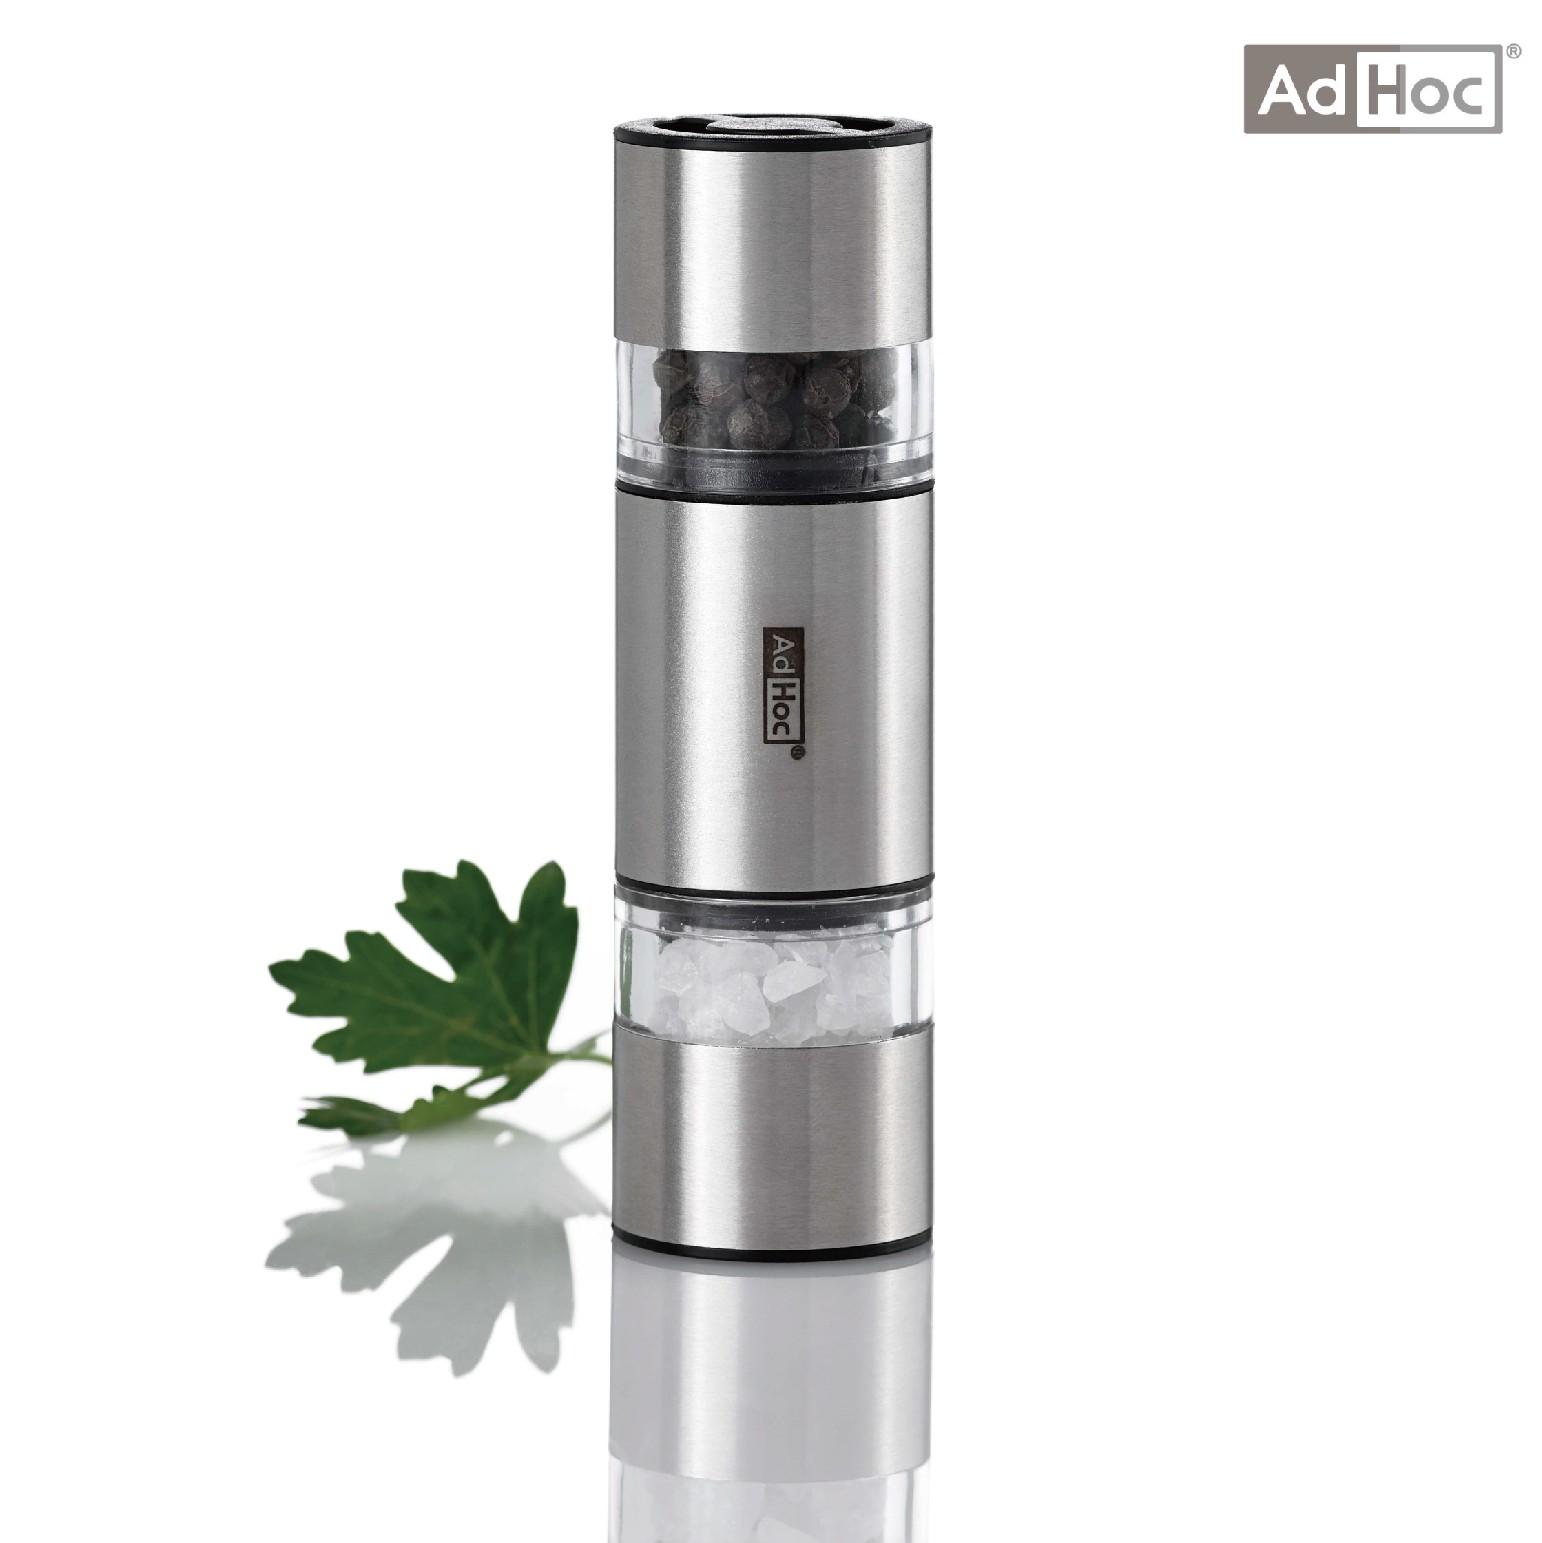 AdHoc 2in1雙邊陶瓷刀研磨罐(MP12)